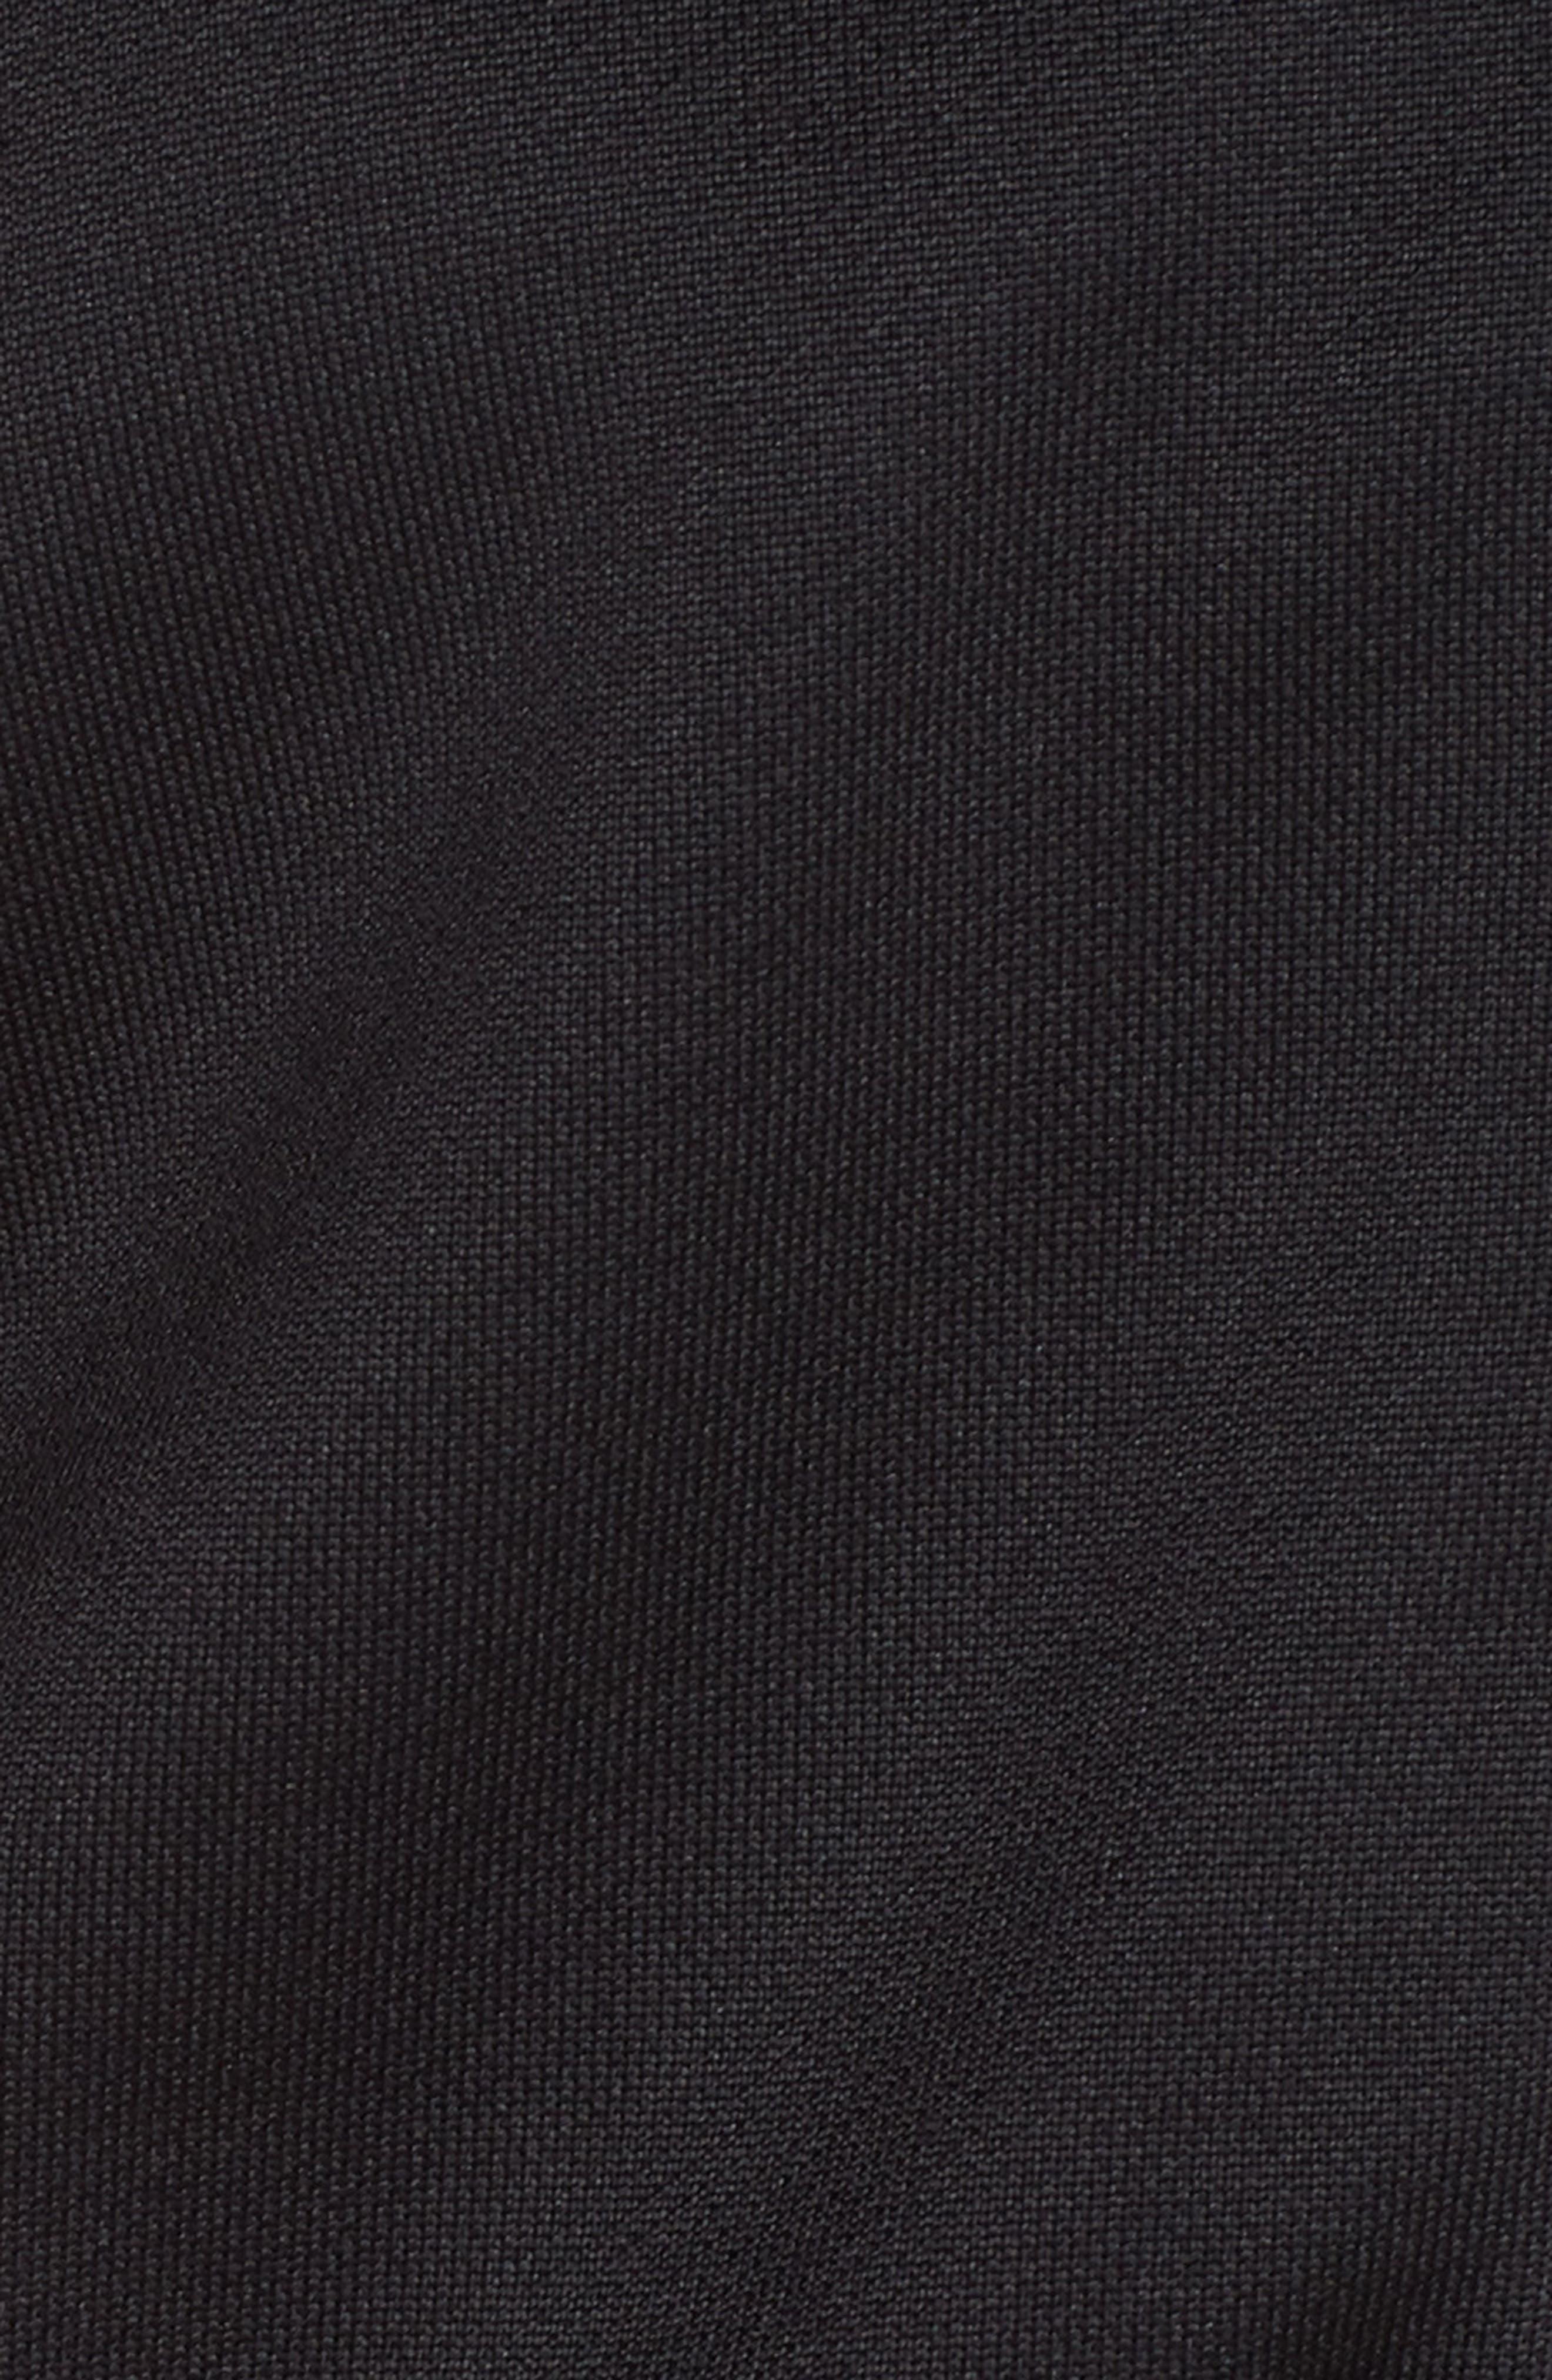 Retro Track Jacket,                             Alternate thumbnail 6, color,                             001